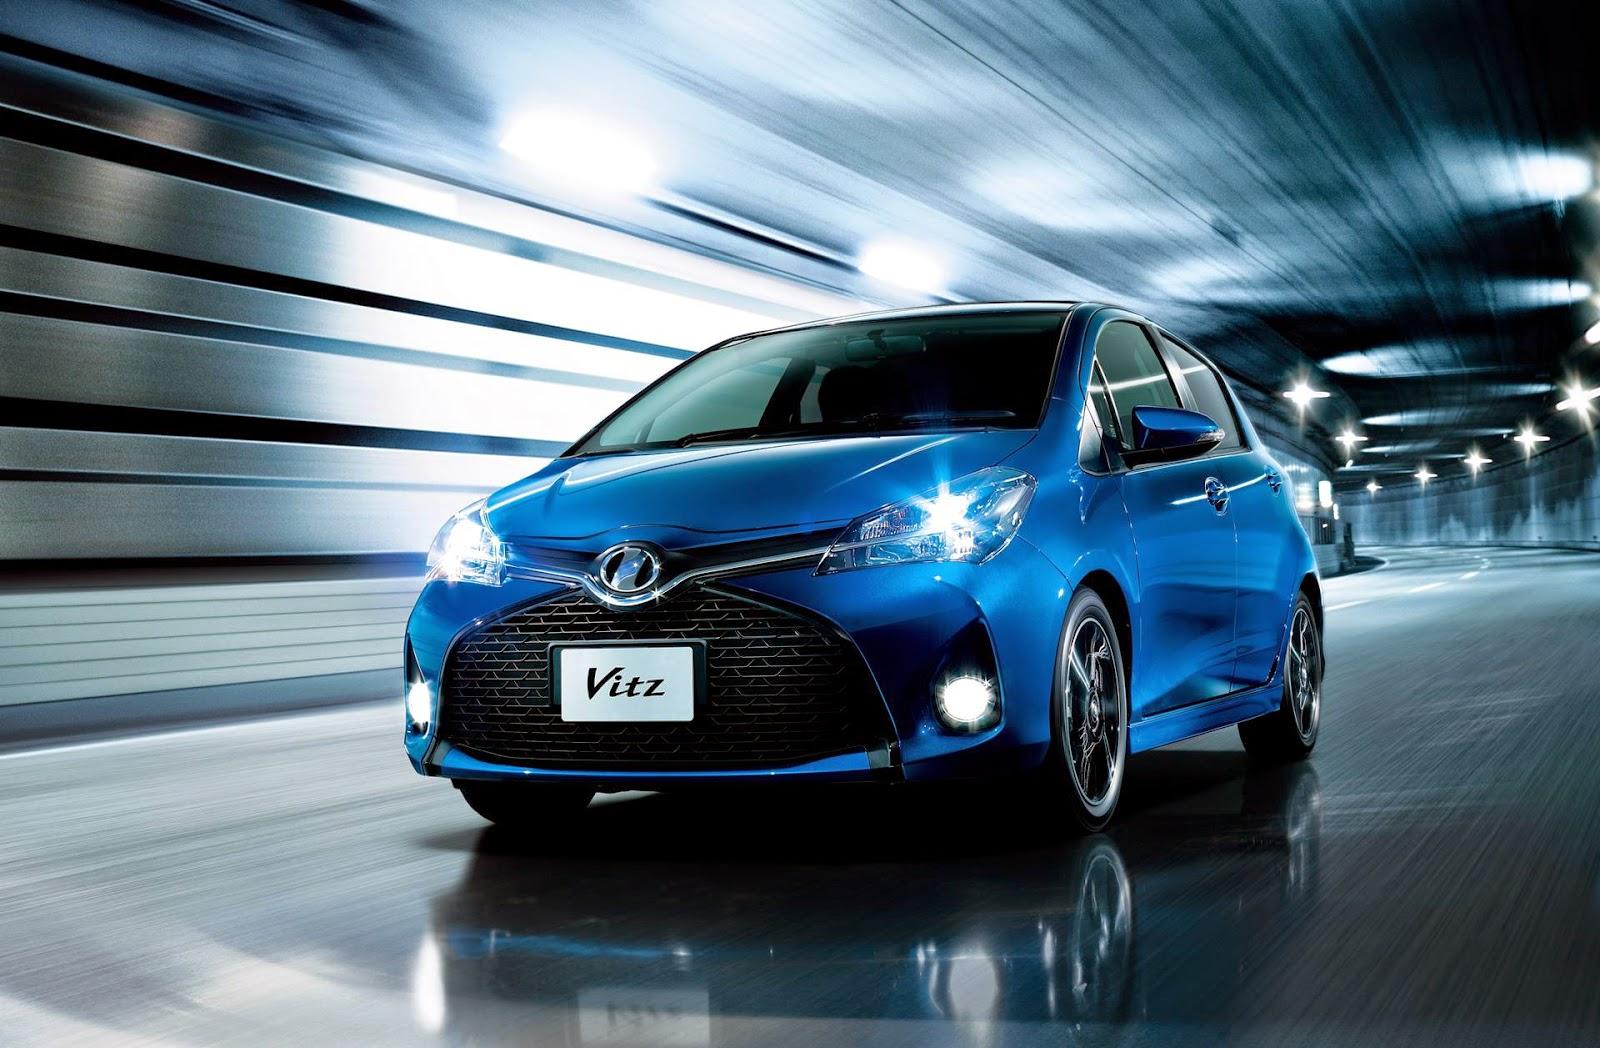 Blue Toyota Vitz driving